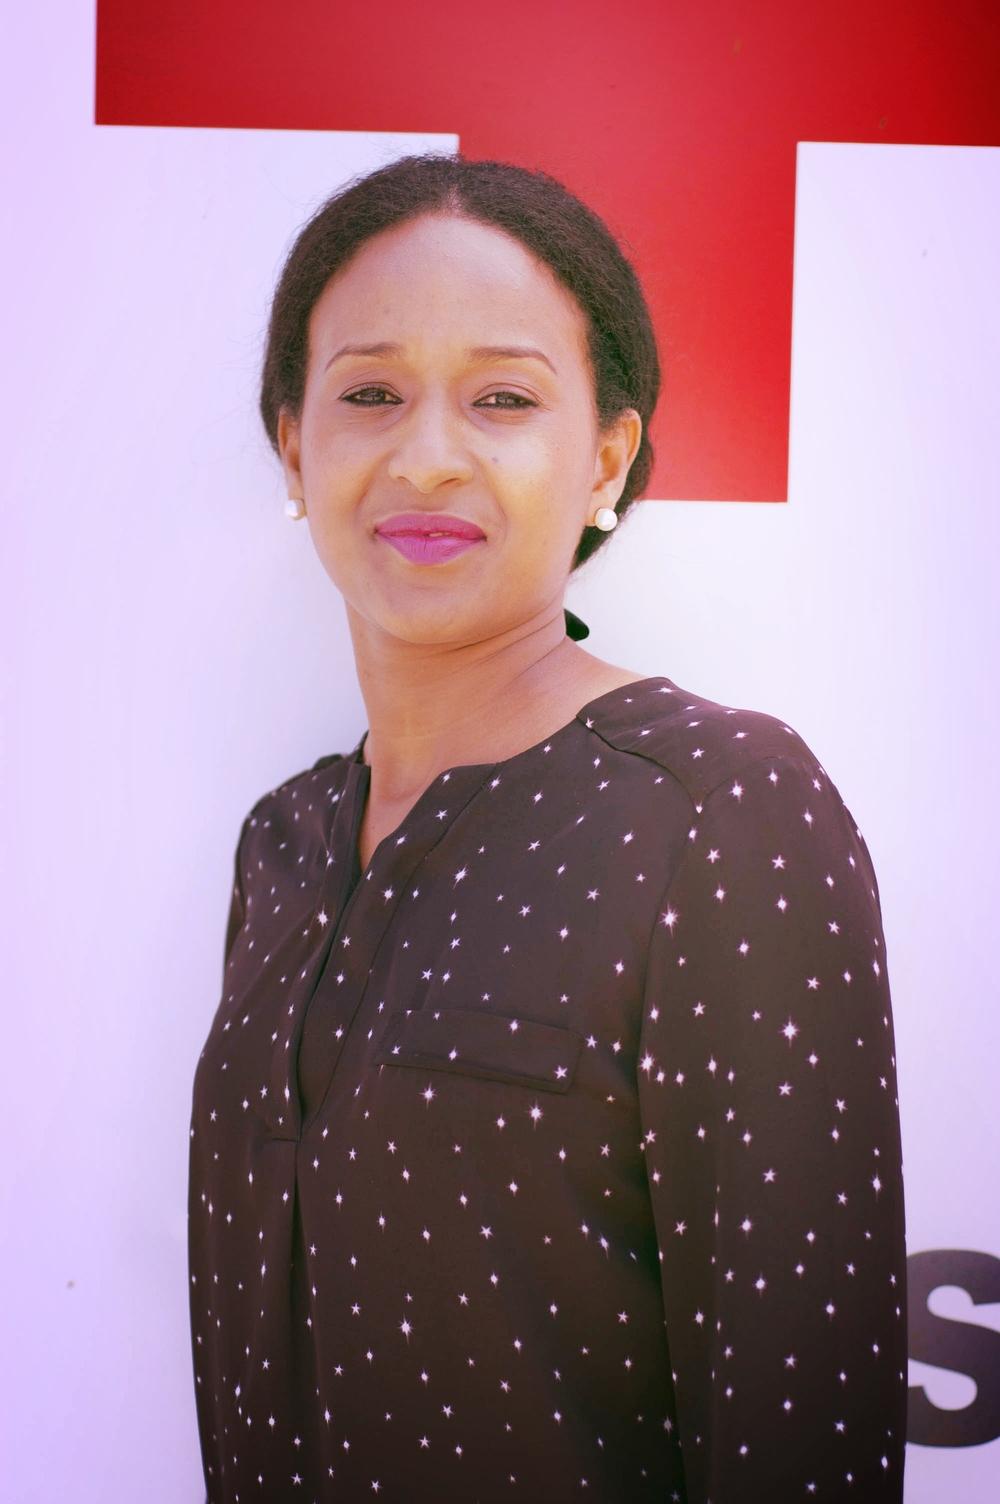 Muzit Mengesha